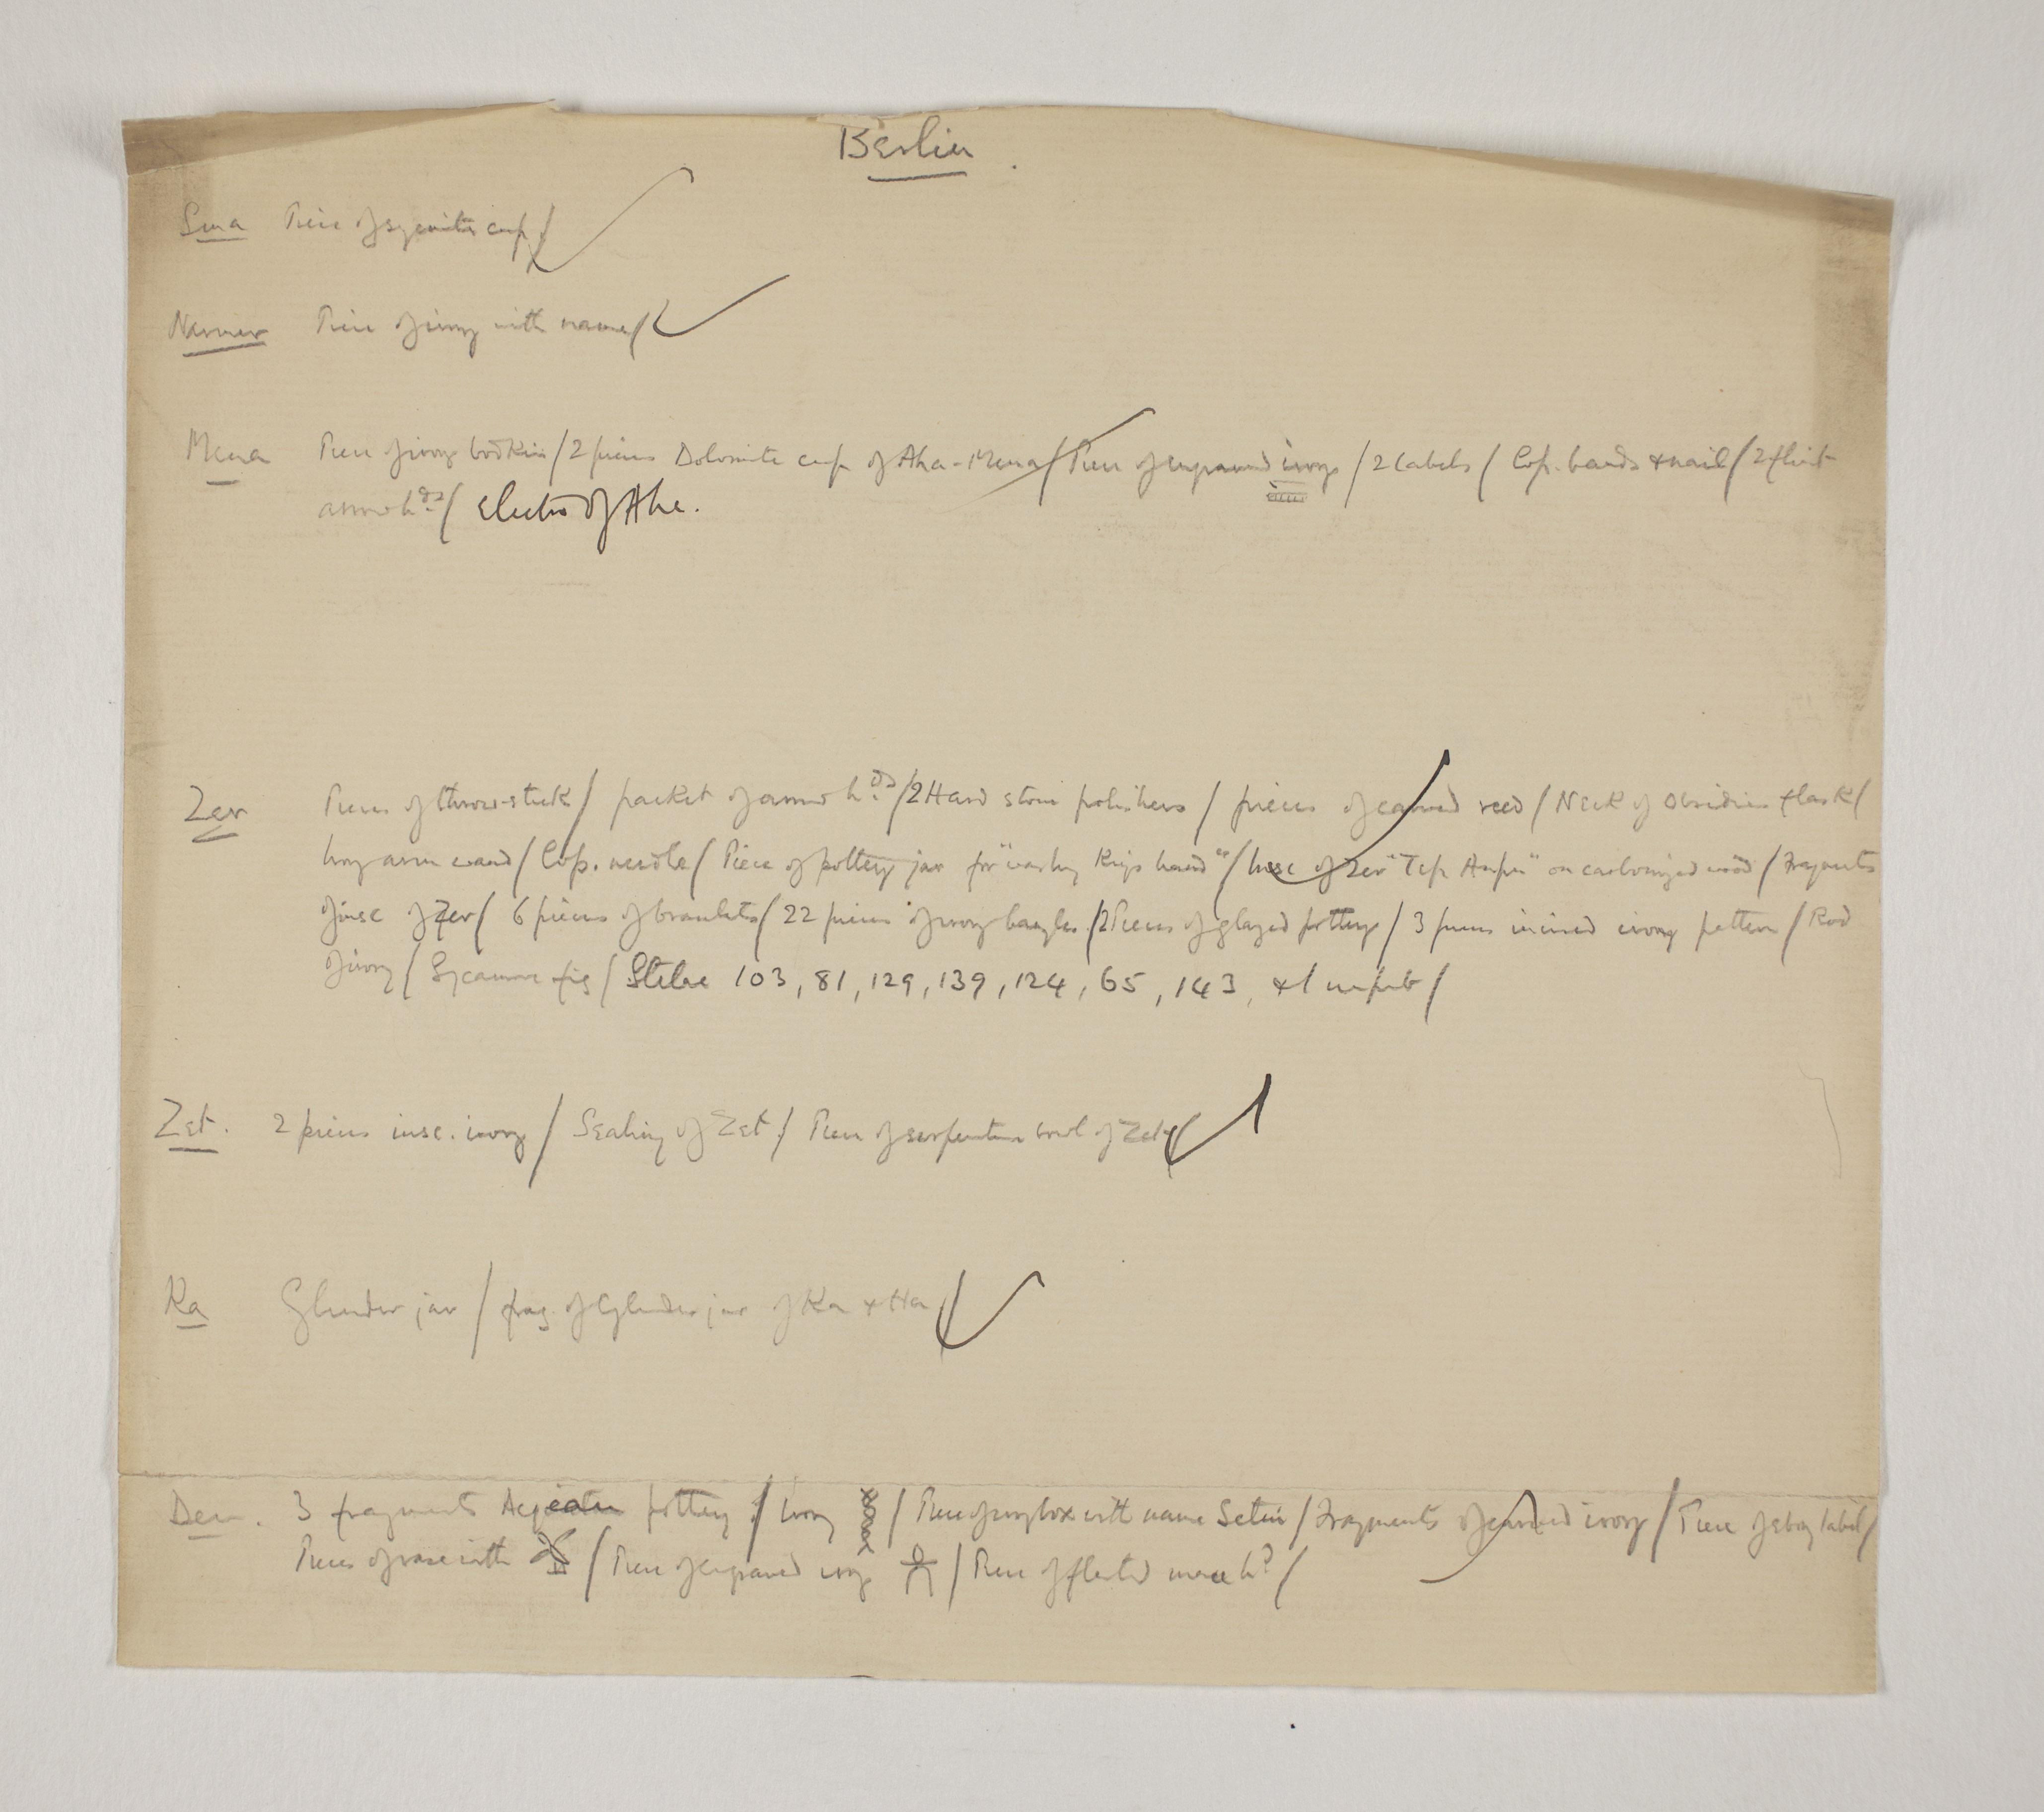 1900-01 Abydos, Bet Khallaf, el-Mahasna Individual institution list  PMA/WFP1/D/9/12.1